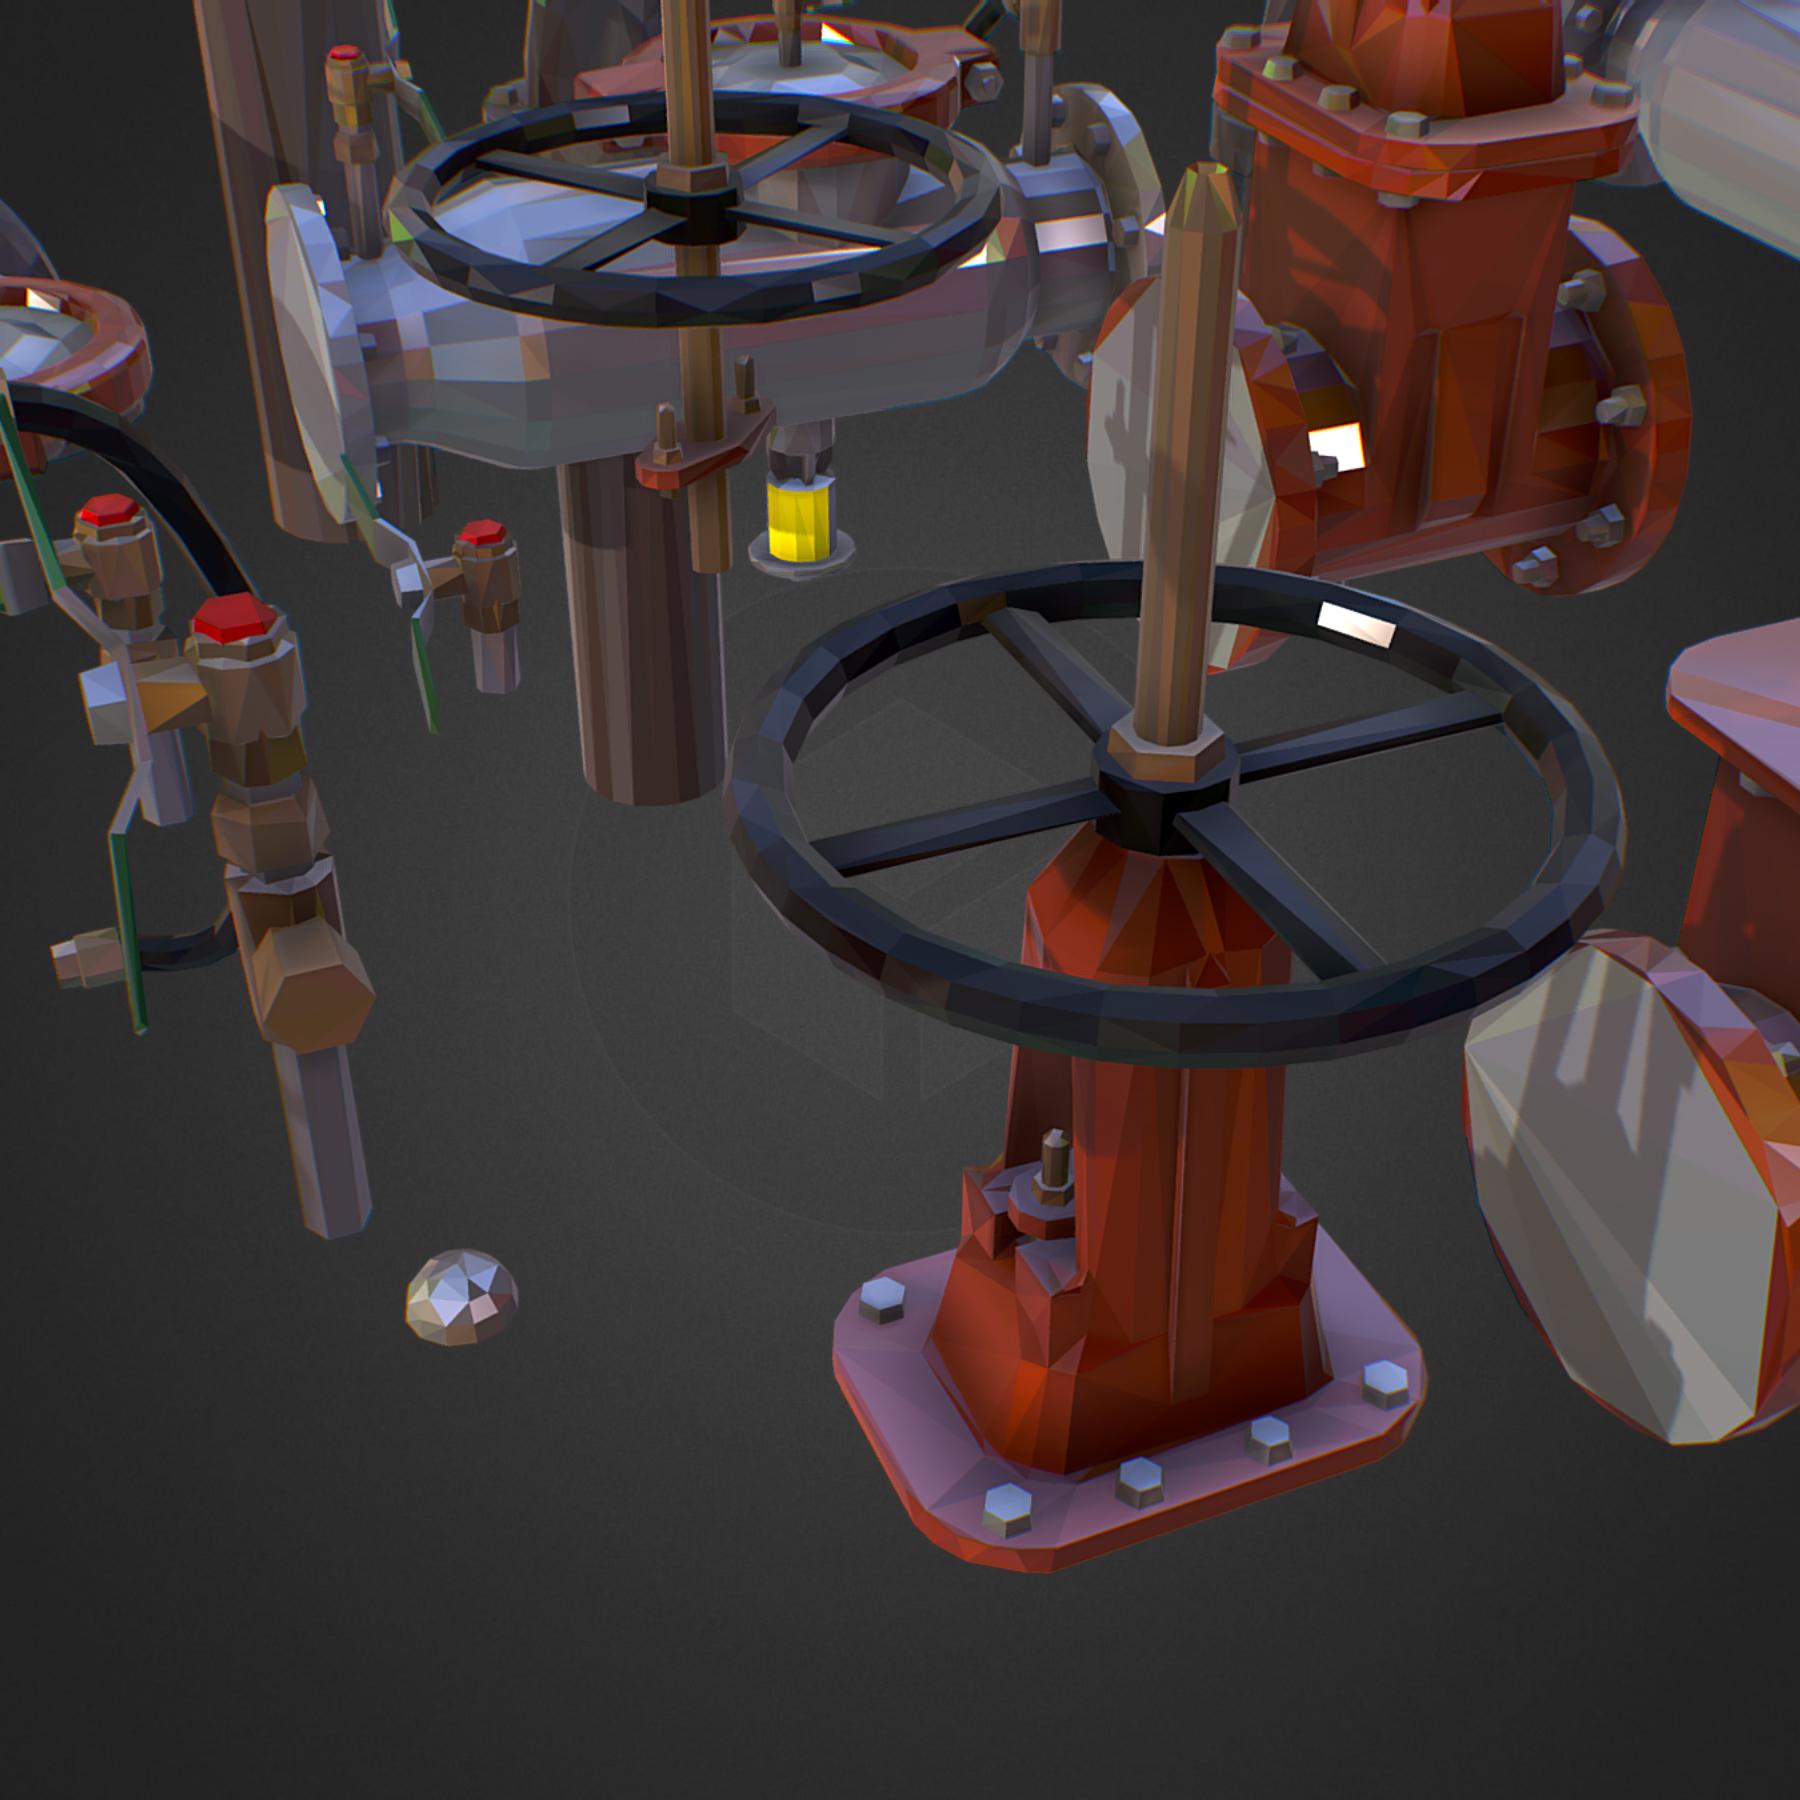 Low Poly ART Backflow Water Pipe Constructor 3d model max 3ds max plugin fbx ma mb tga targa icb vda vst pix obj 272551